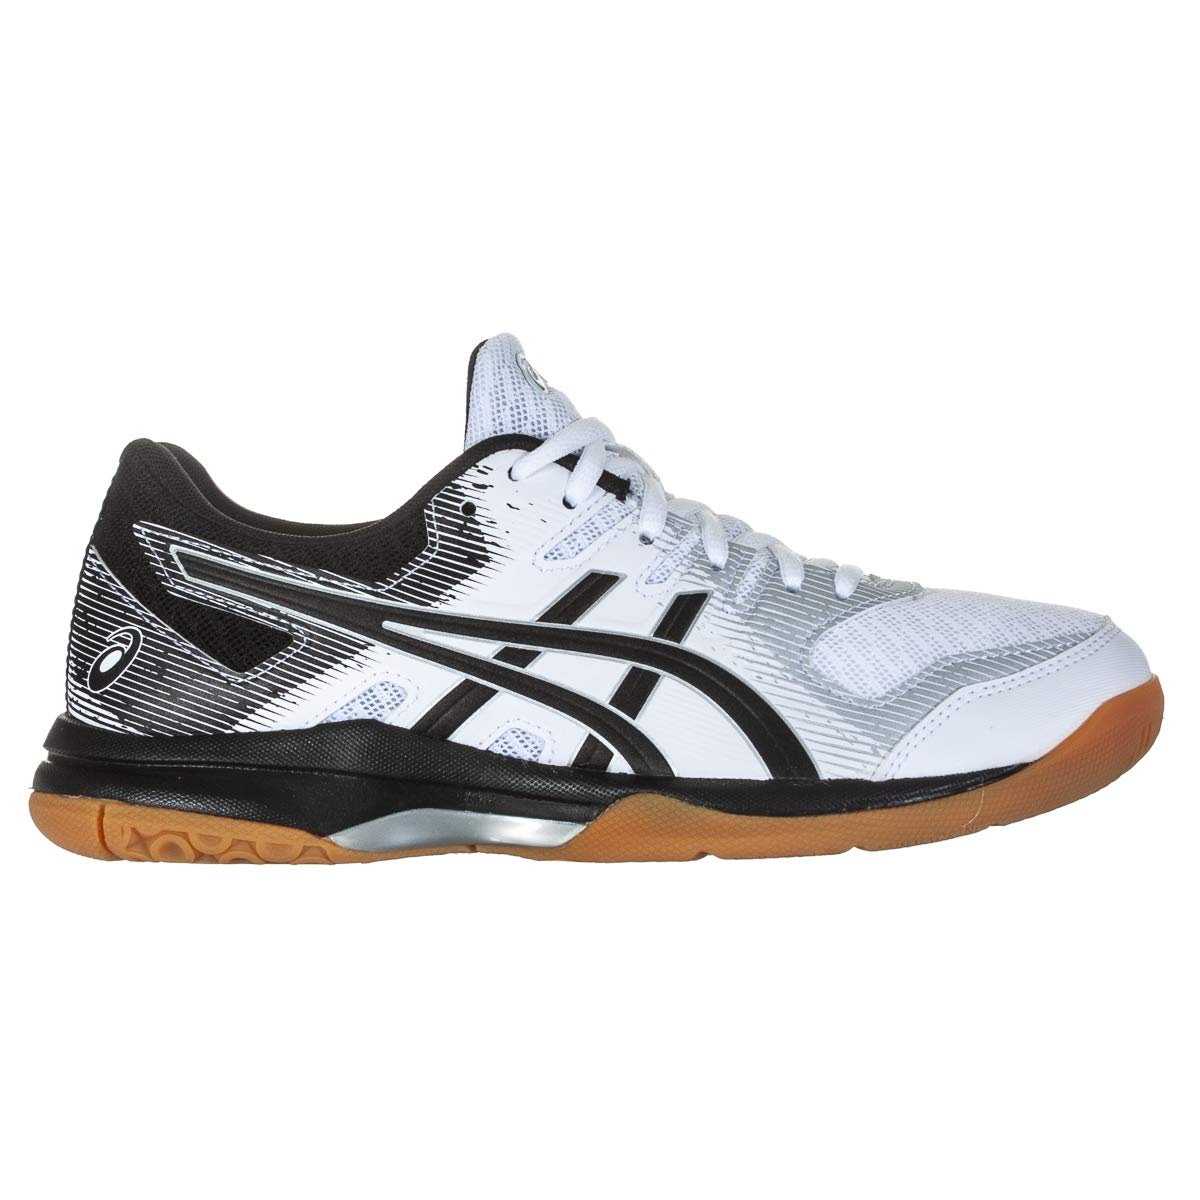 Chaussures Indoor Court Shoe Femme ASICS Gel-Rocket 9 Chaussures ...